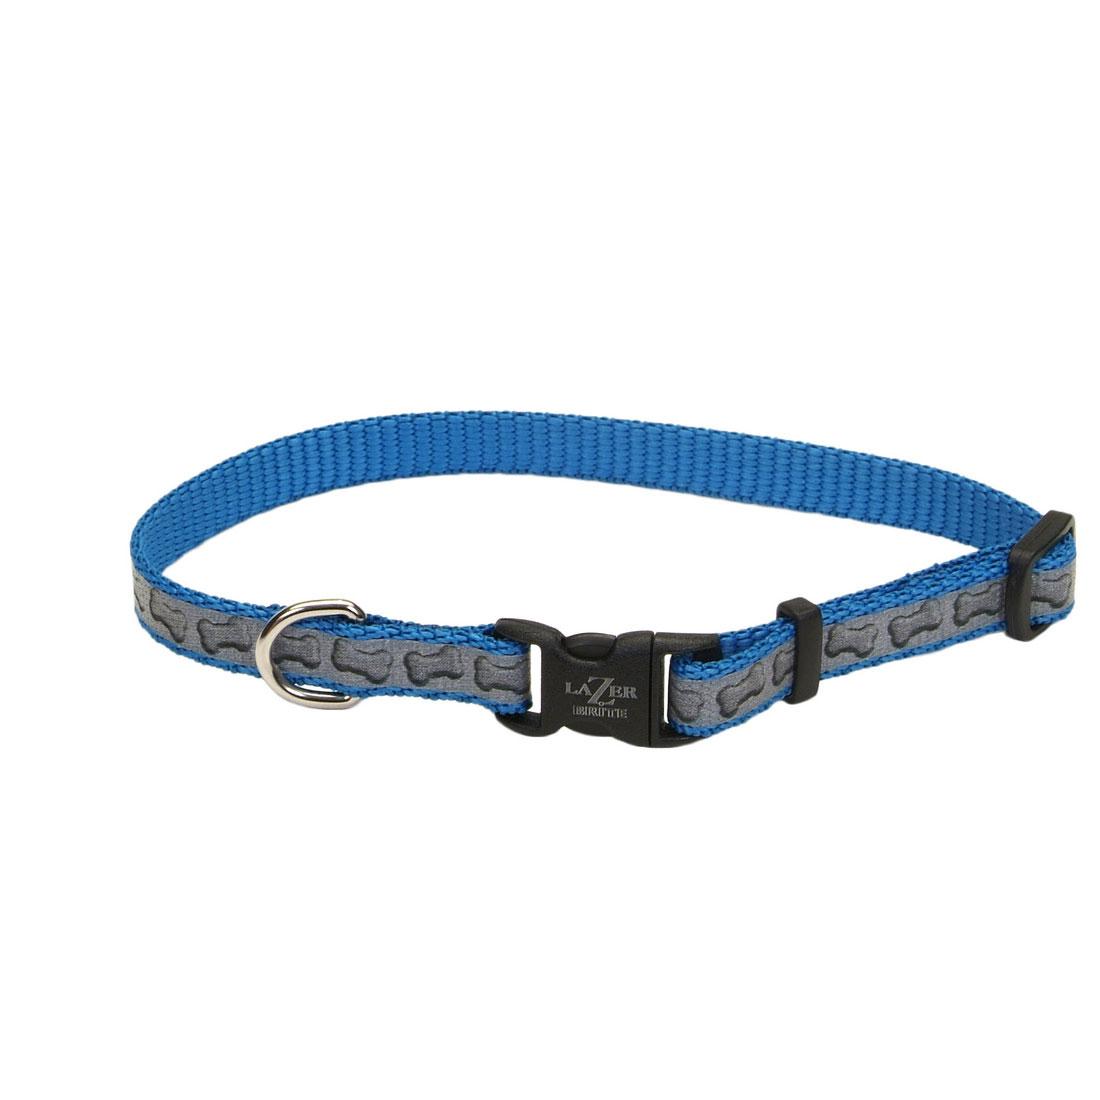 Lazer Brite Reflective Adjustable Dog Collar, Turquoise Bones Image